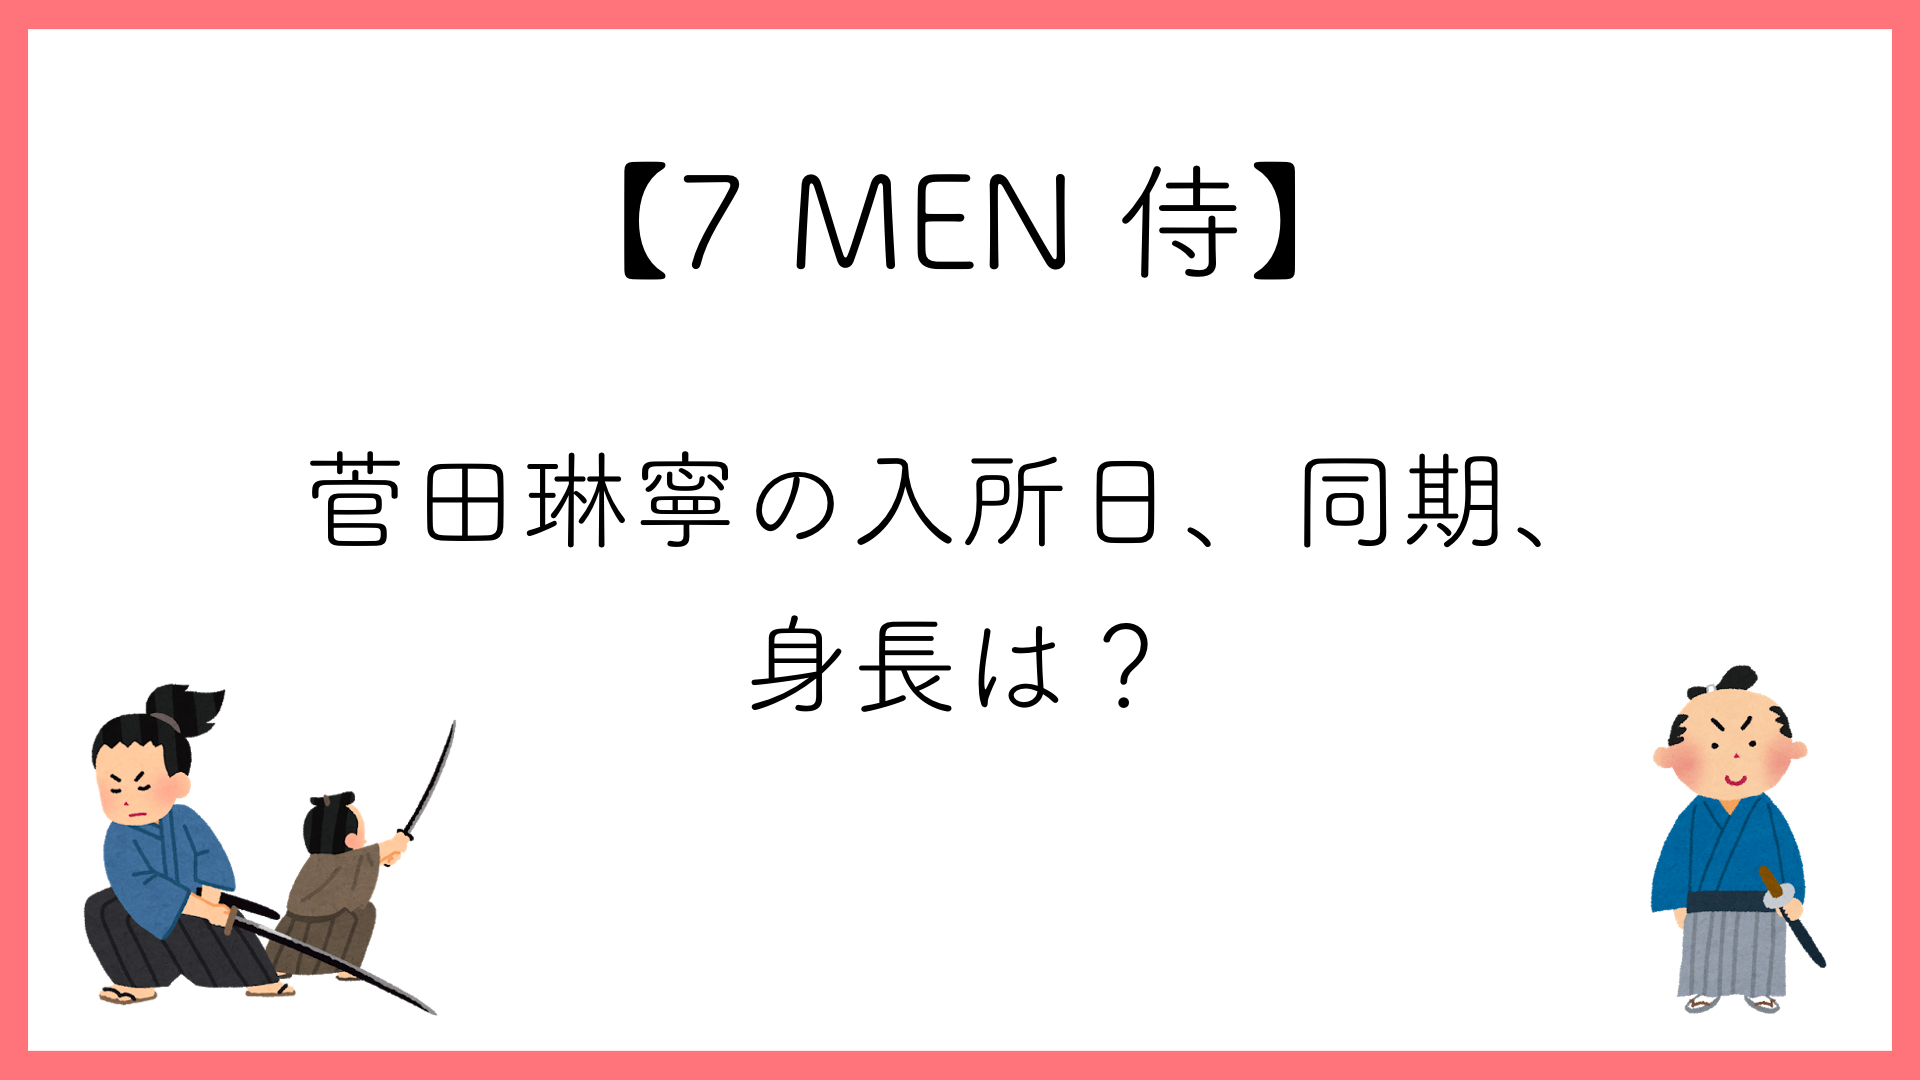 【7 MEN 侍】菅田琳寧の入所日、同期、身長は?